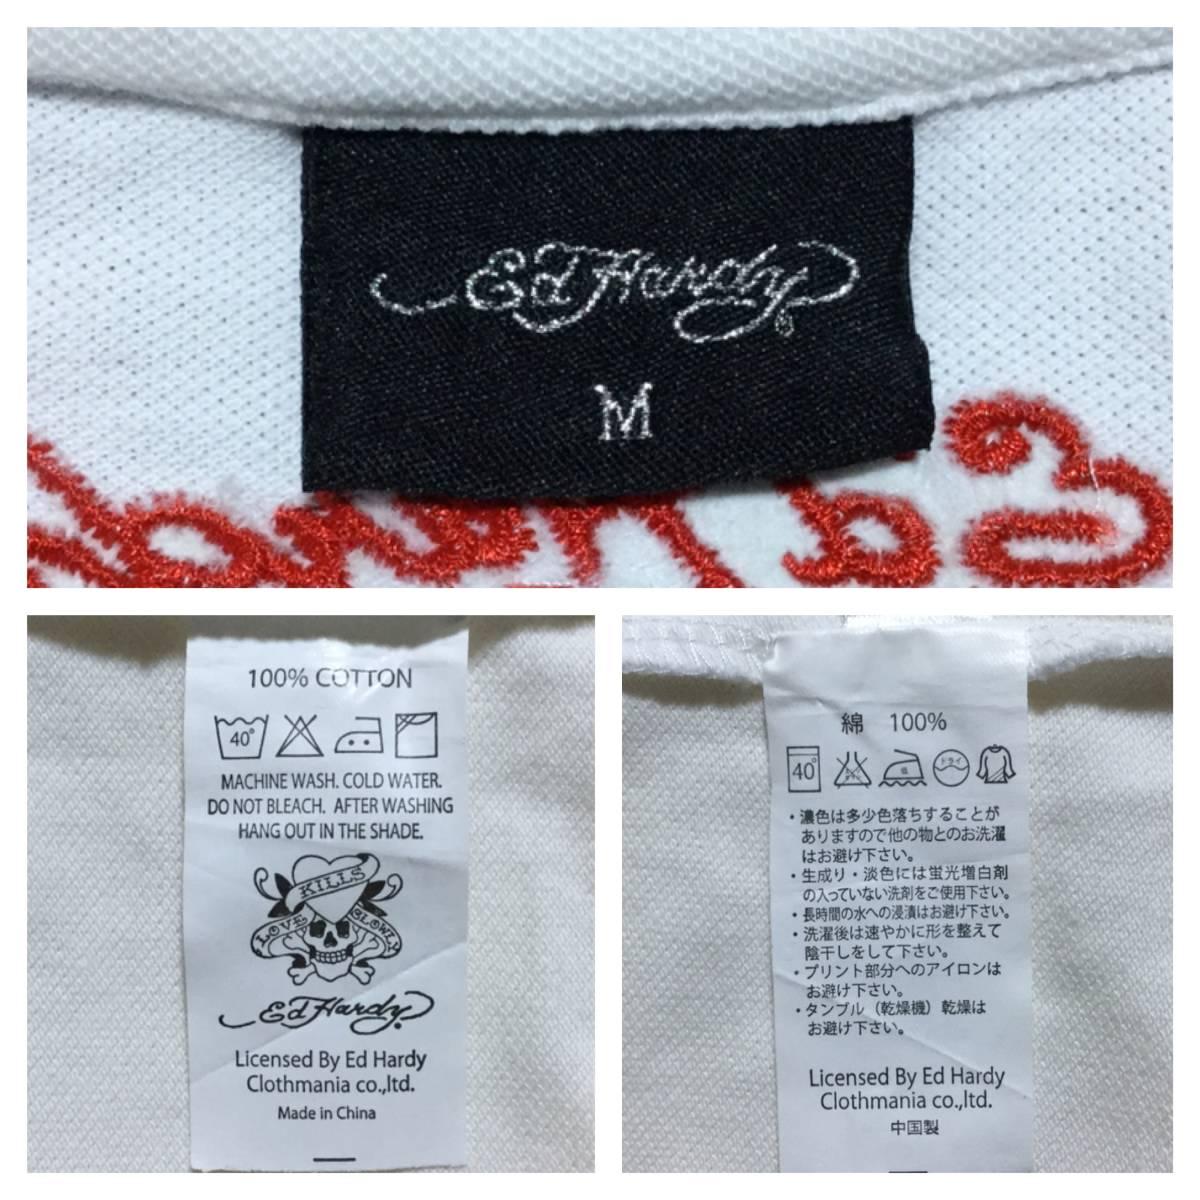 ED HARDY エドハーディー // 刺繍 プリント 半袖 ポロシャツ (白) サイズ M_画像5